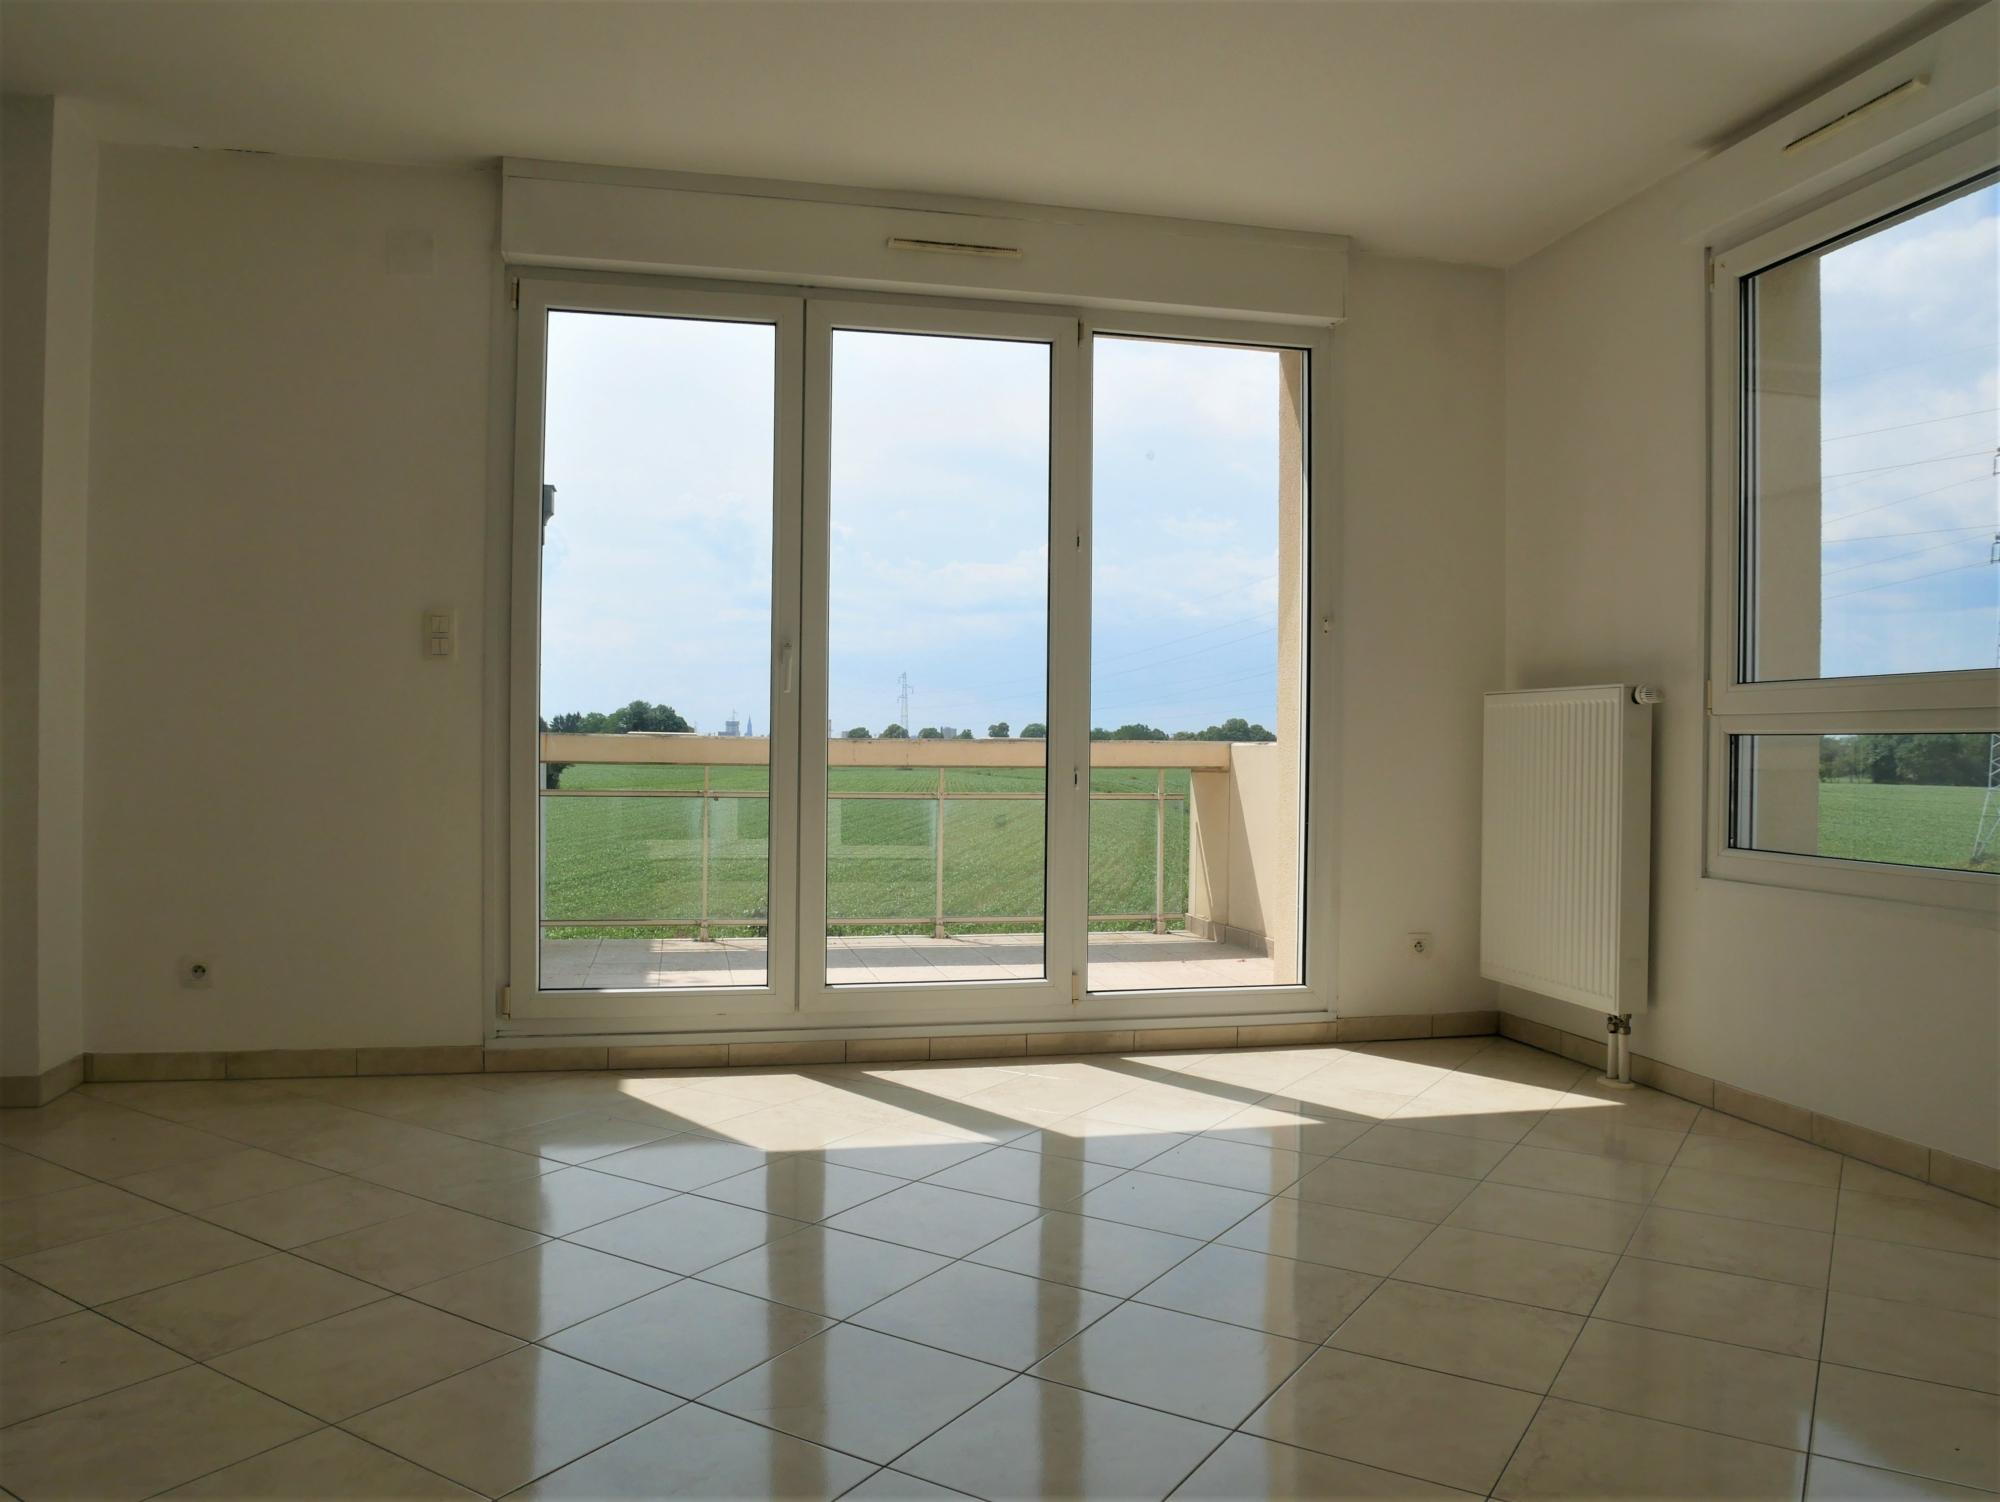 [Fresh] Lumineux 3 pièces avec balcon et parking - Souffelweyersheim - nos ventes - Beausite Immobilier 2